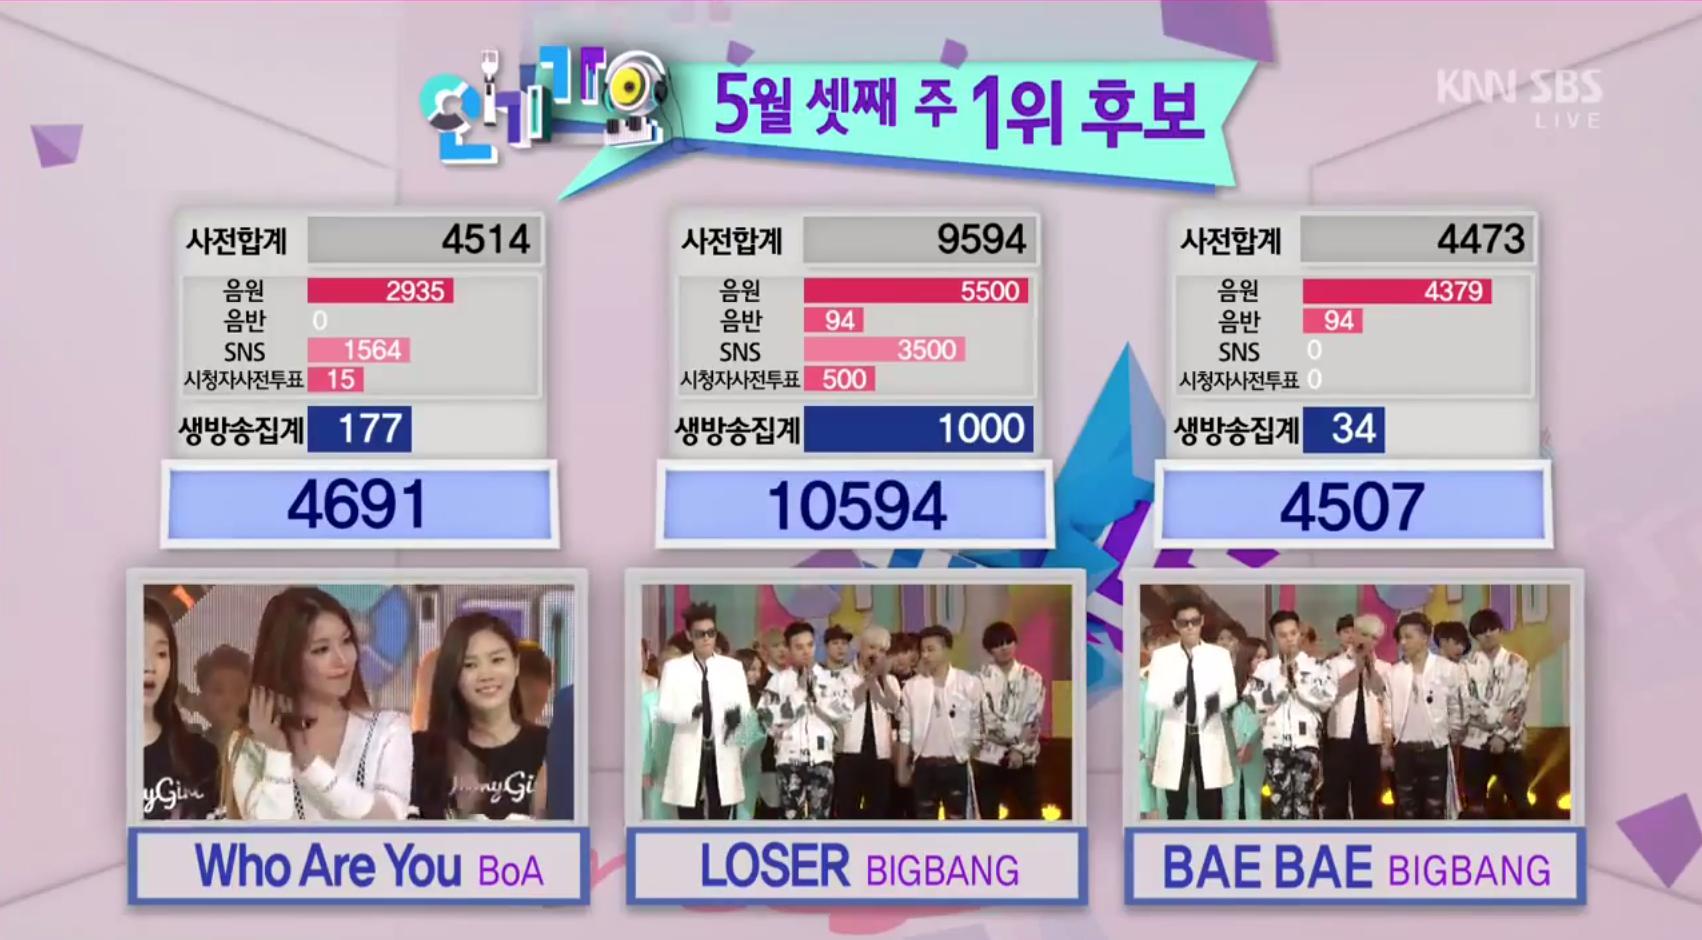 bigbang inkigayo win boa